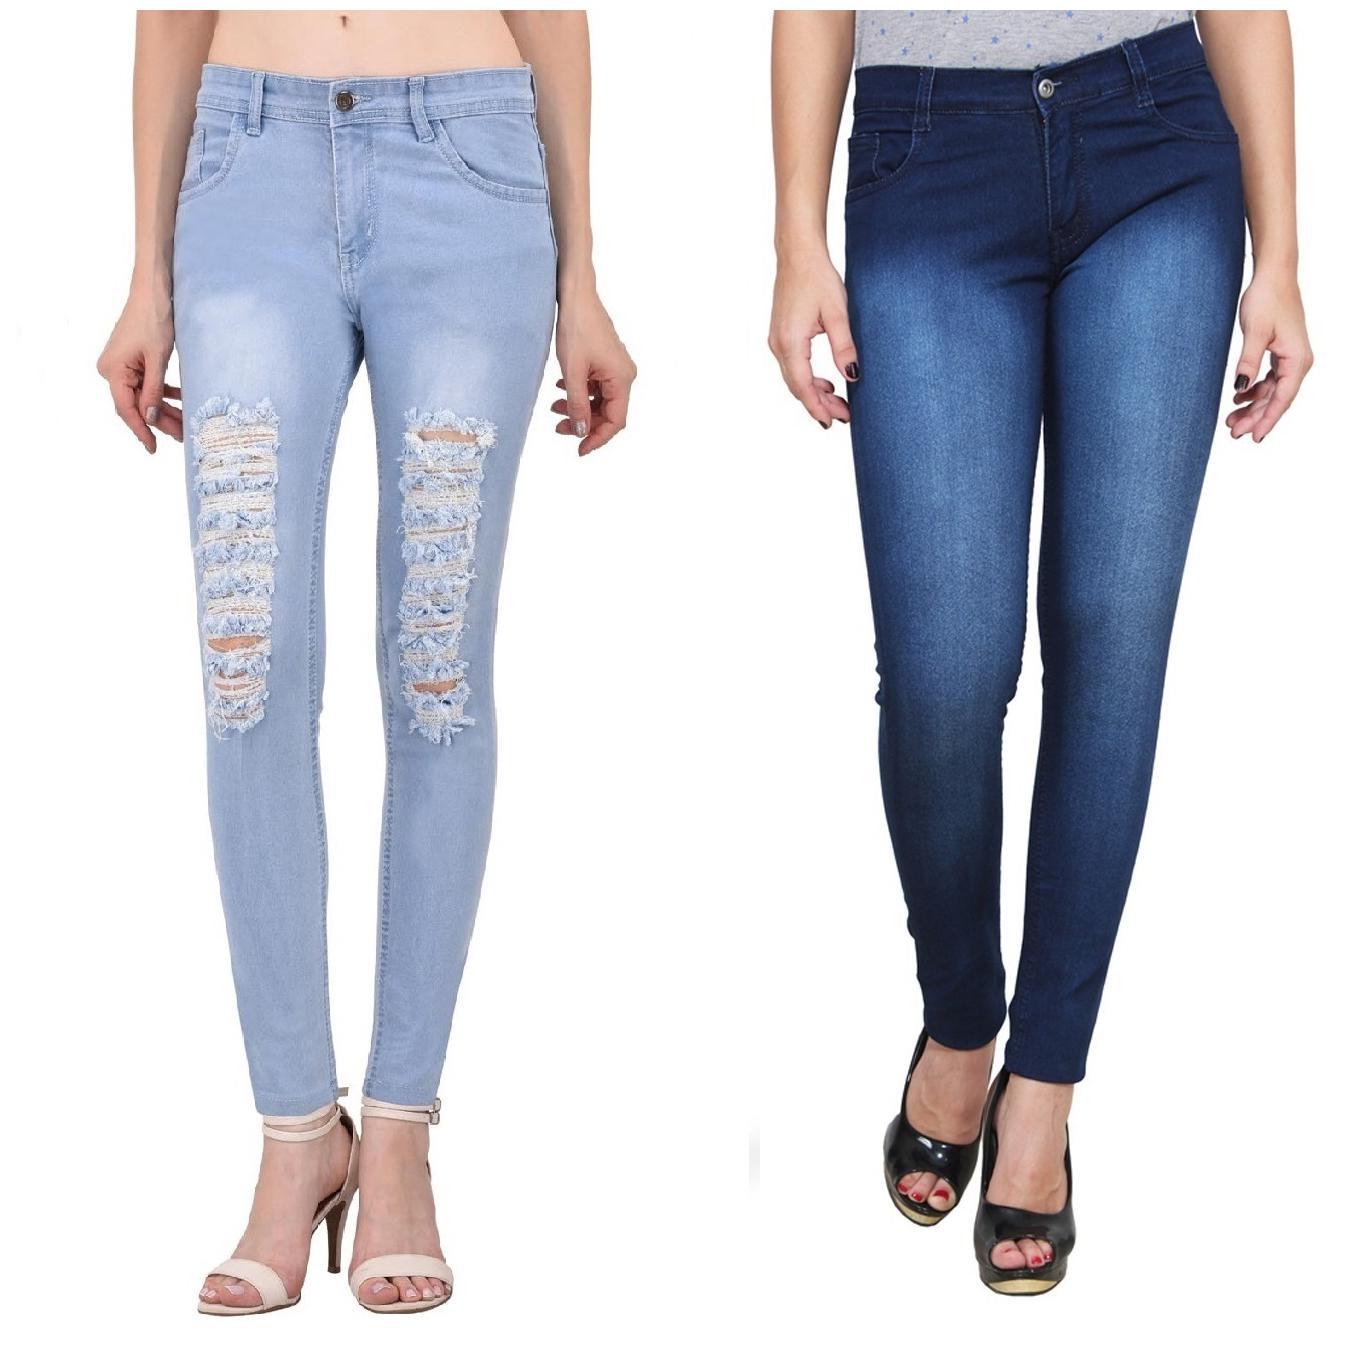 Ansh Fashion Wear Women's Denim Jeans - Regular Fit - Pack of 2 - T5LB-DBM